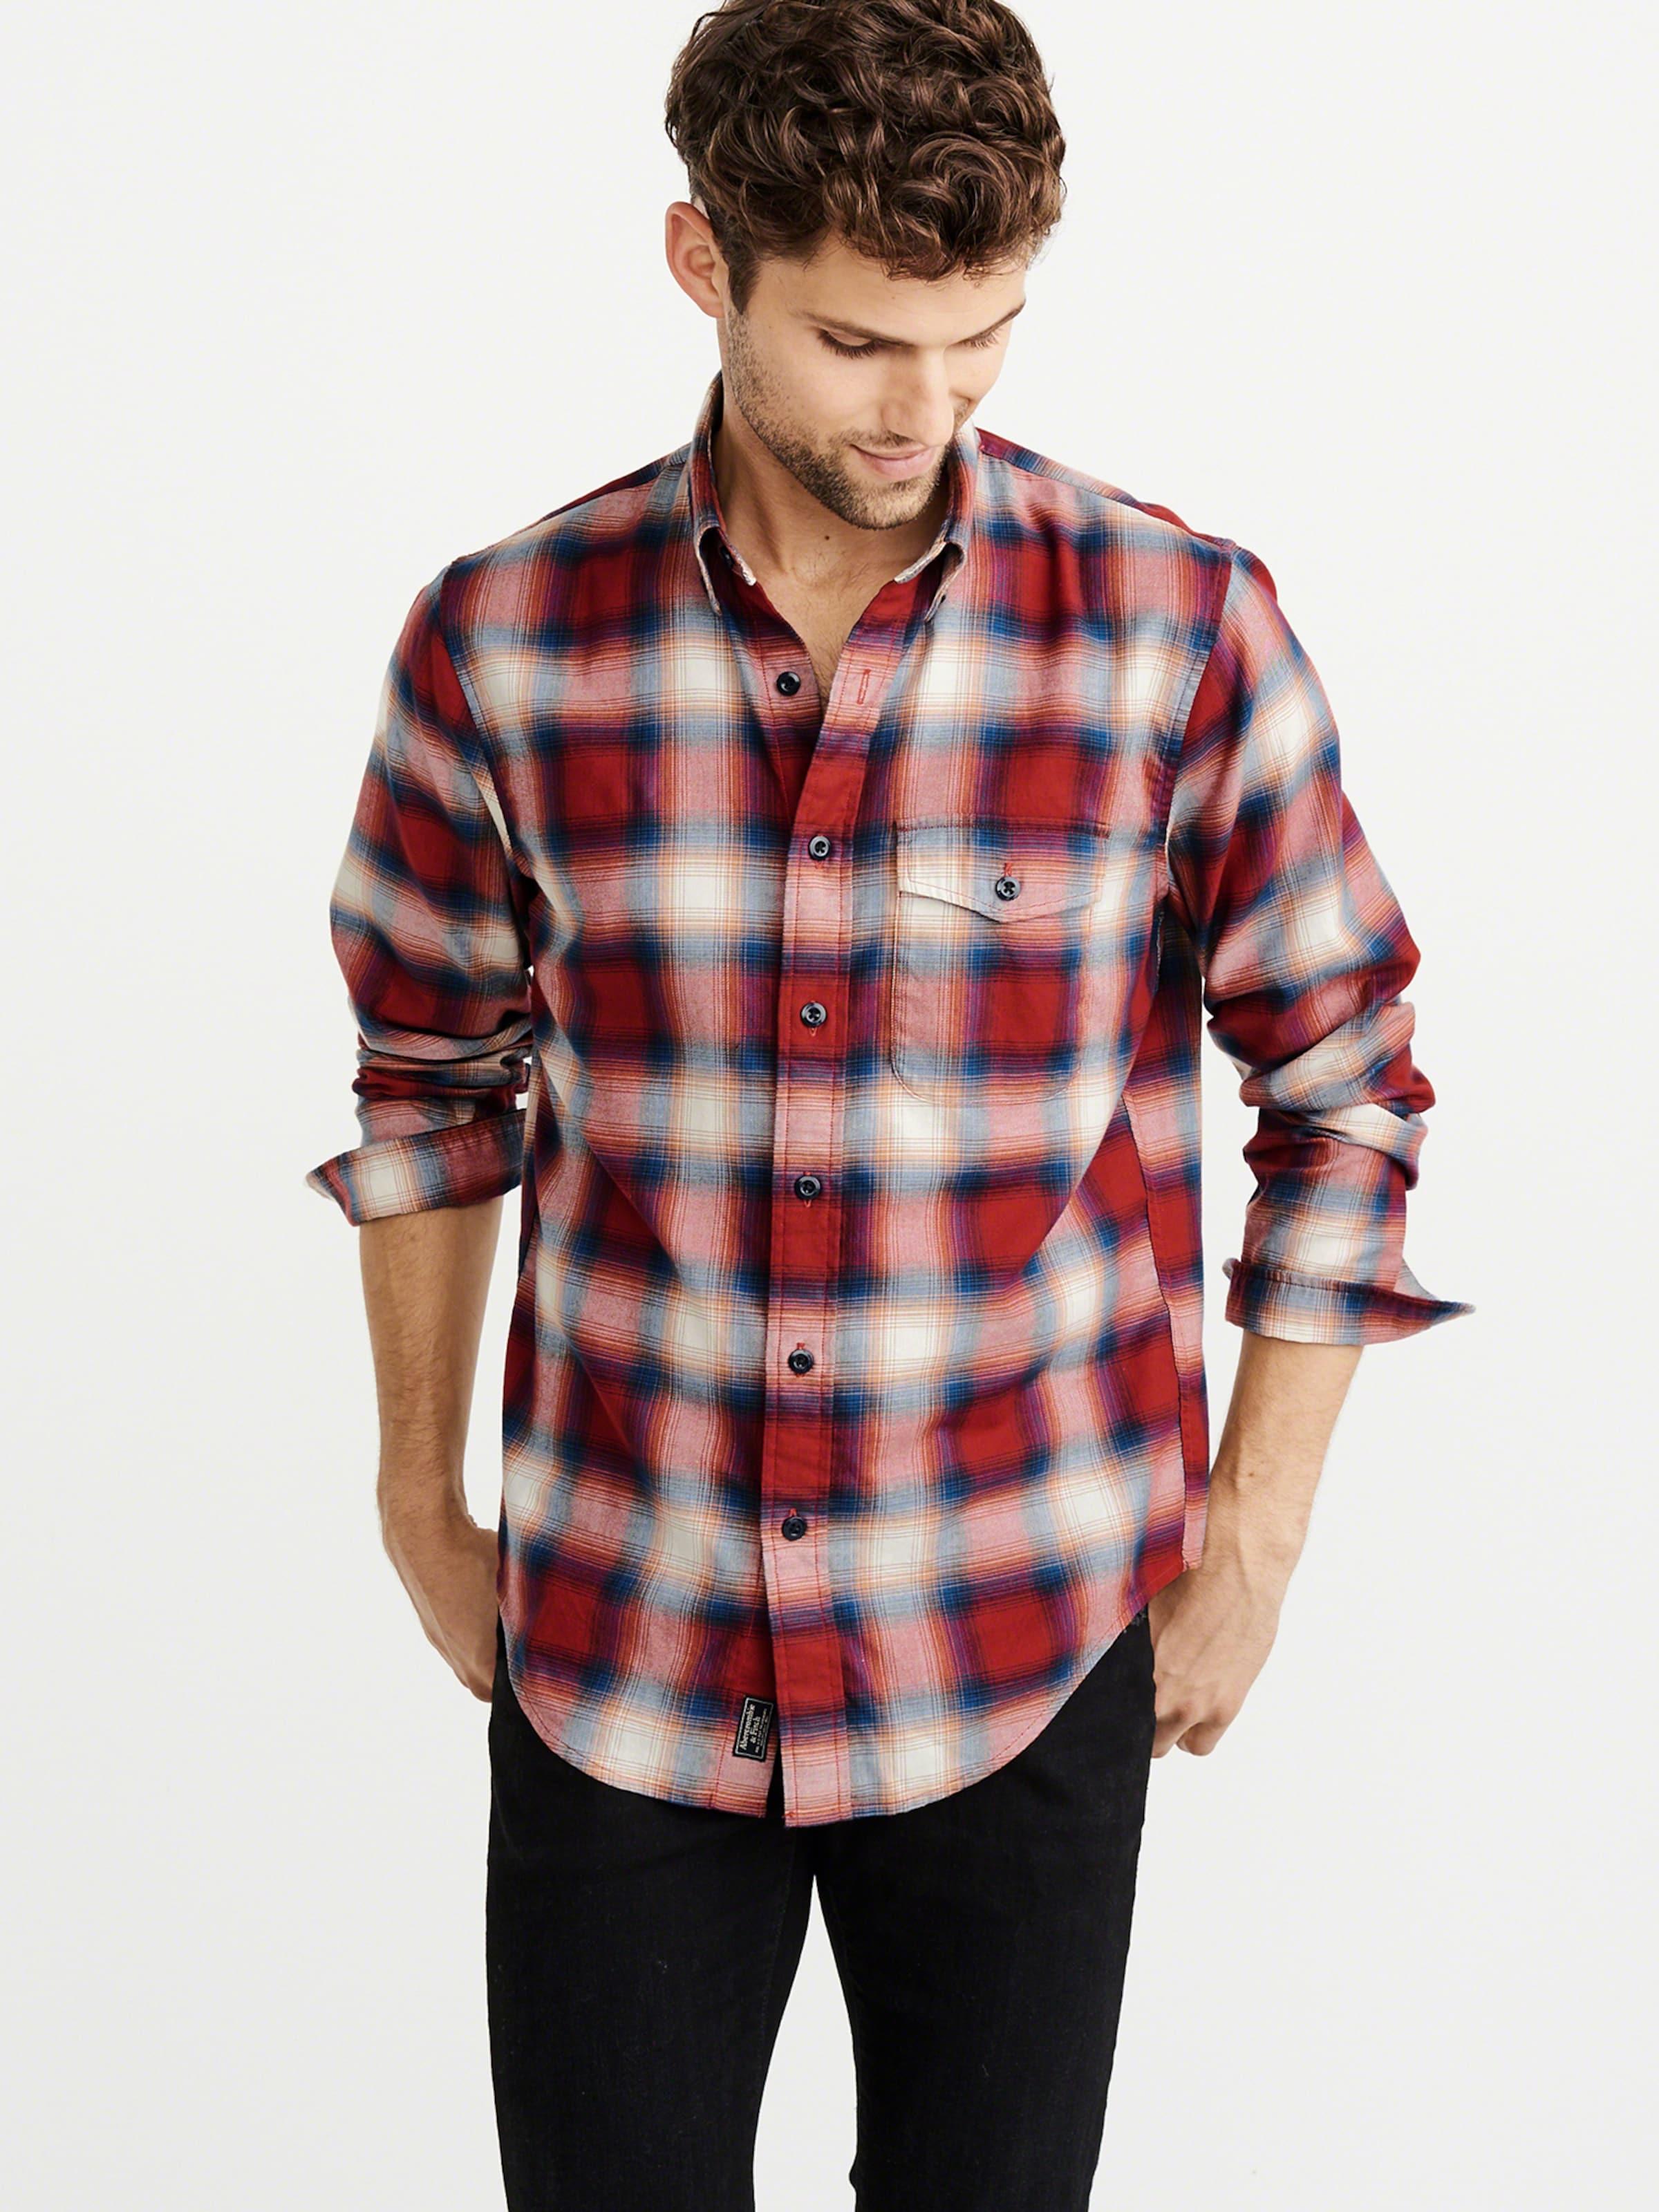 BlauRot Shirt Fitch Twill 6cc' 'stretch Ccmd Naturweiß Abercrombieamp; In Hemd PZukXOi